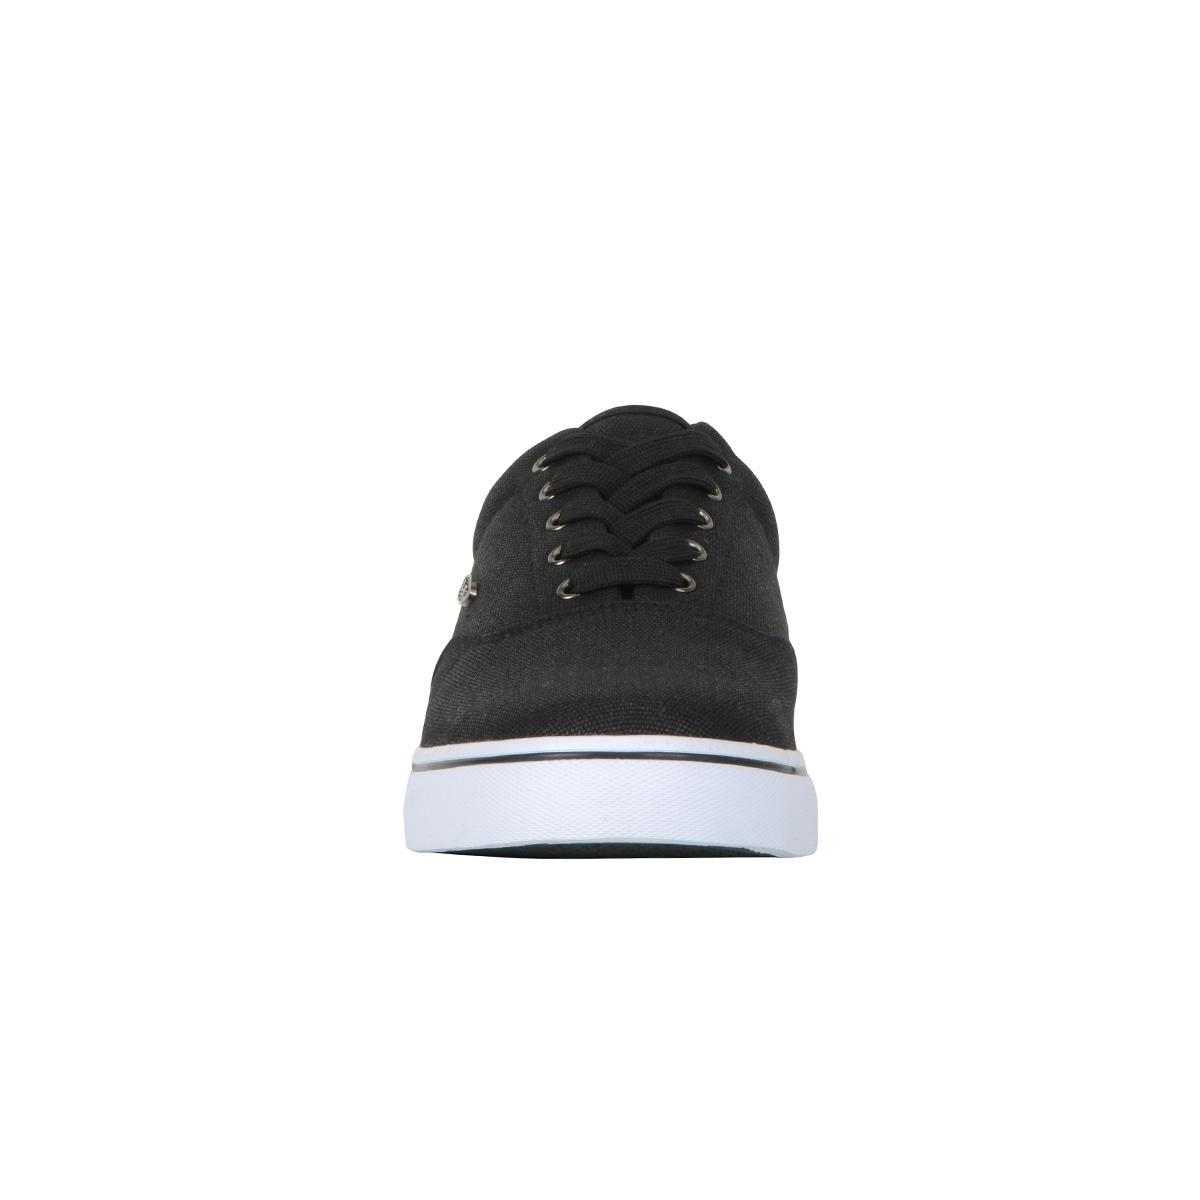 dda274cfa7f Shop Lugz Men s Vet CC Vulcanized Canvas Sneaker - Free Shipping On Orders  Over  45 - Overstock.com - 22897292